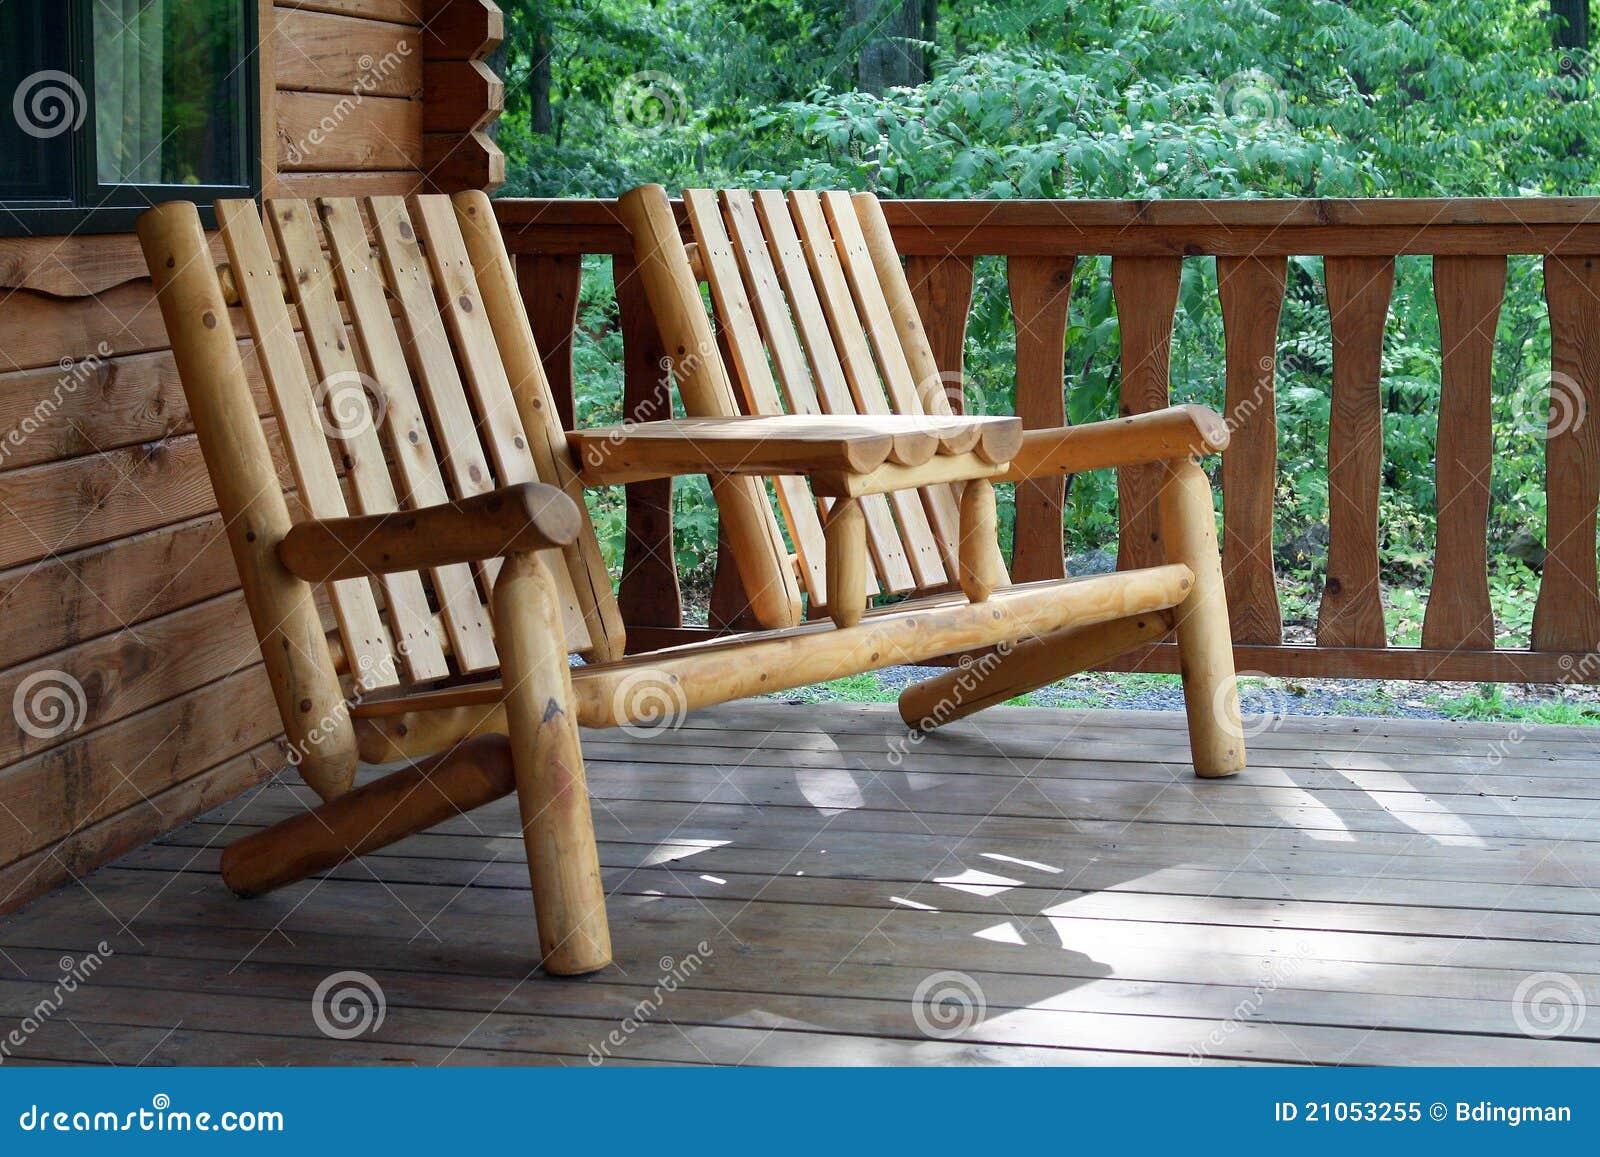 ся стул деревенский